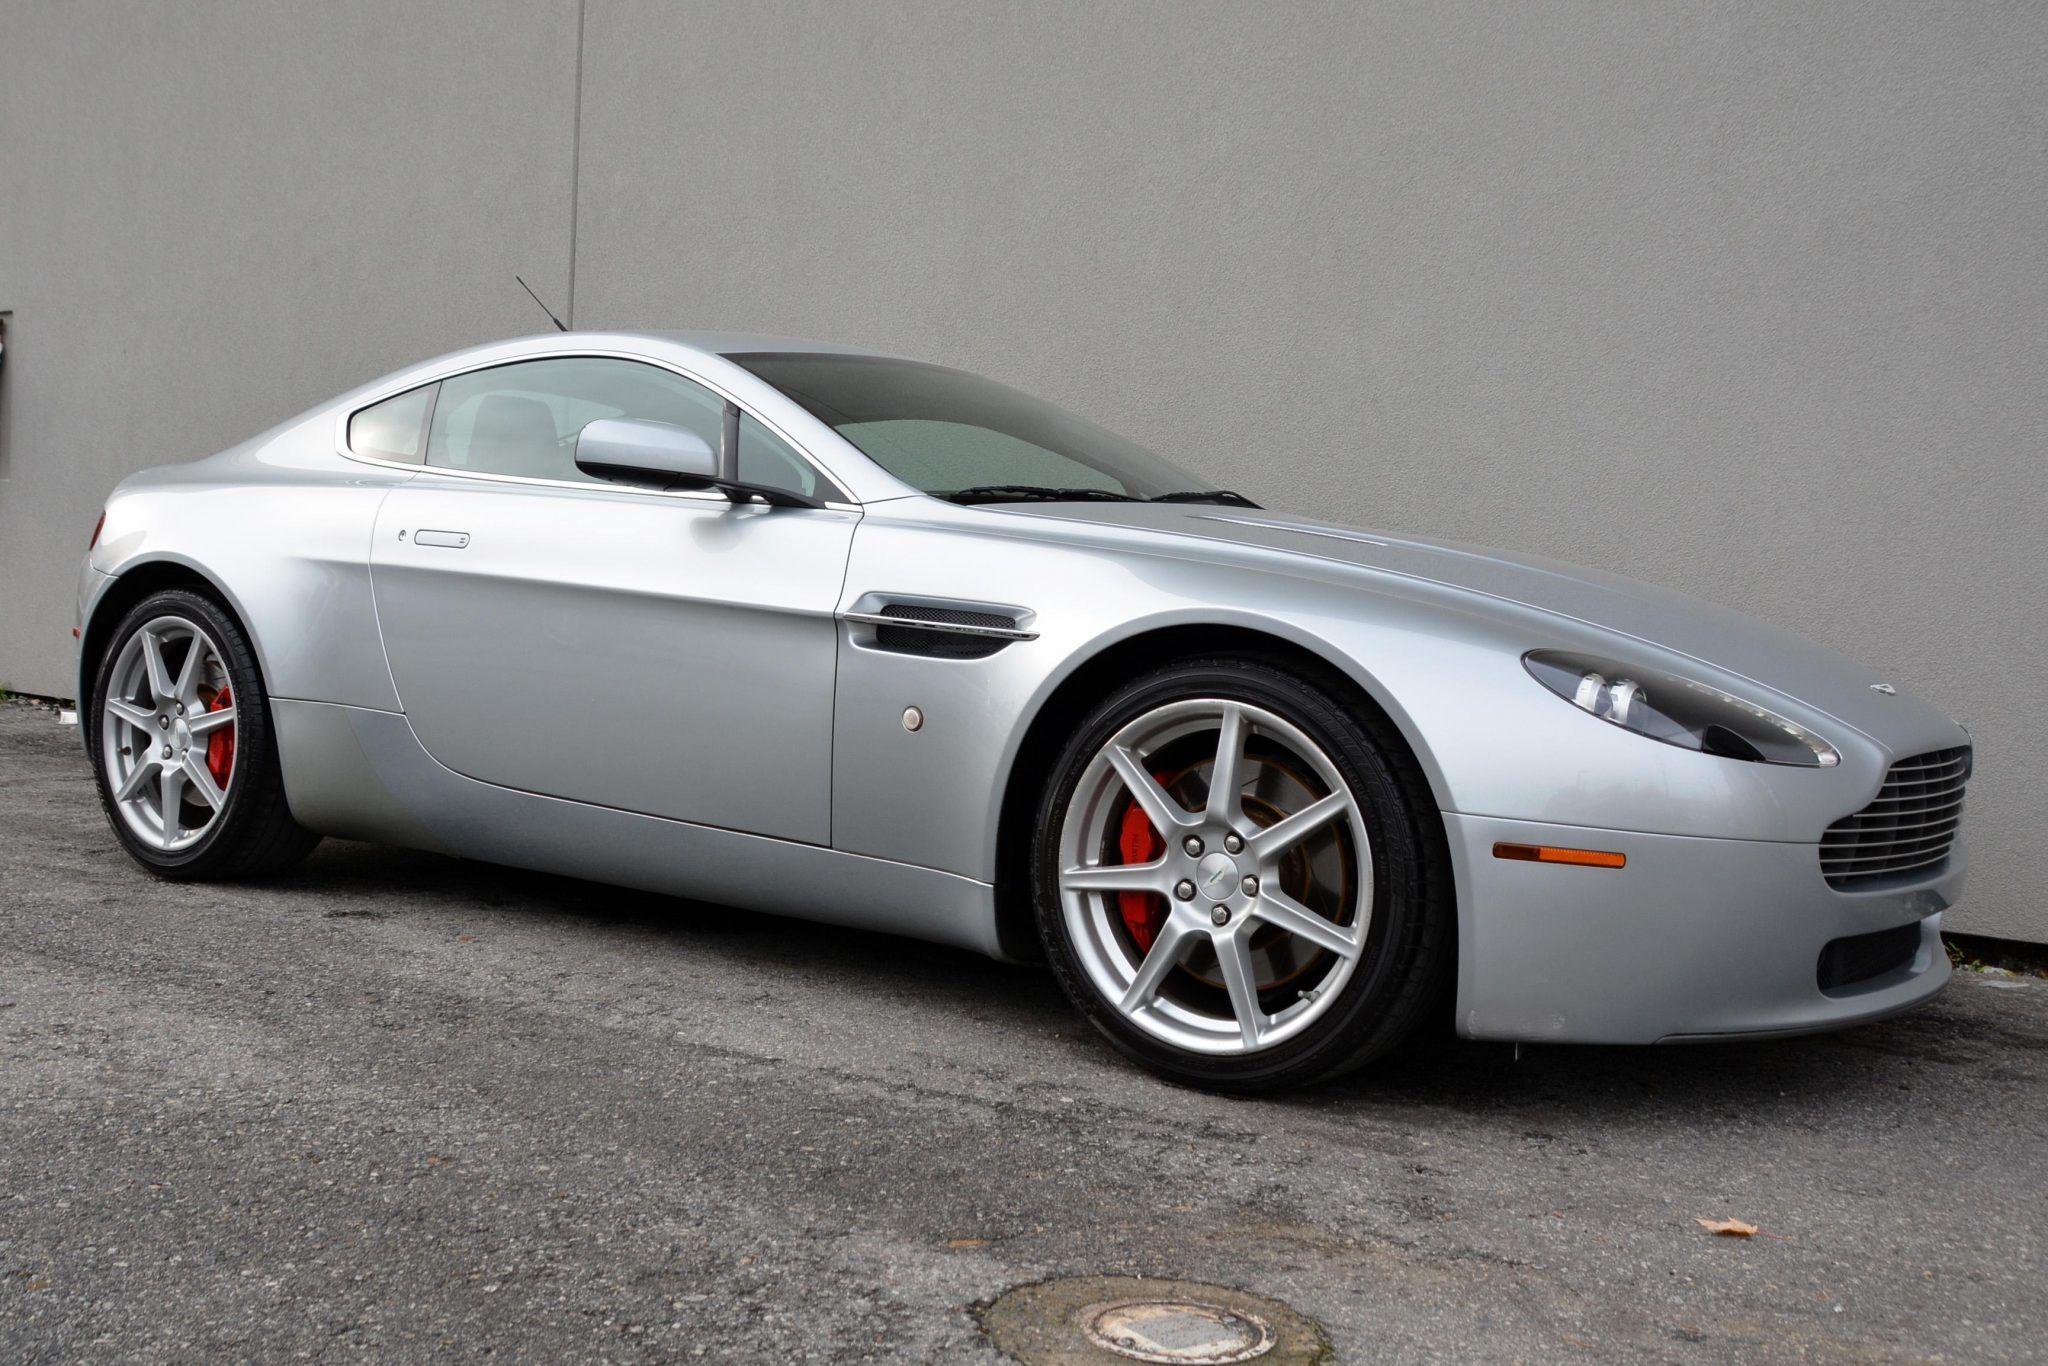 2007 Aston Martin V8 Vantage Coupe 6 Speed Vin Scfbb03b97gc04432 Classic Com